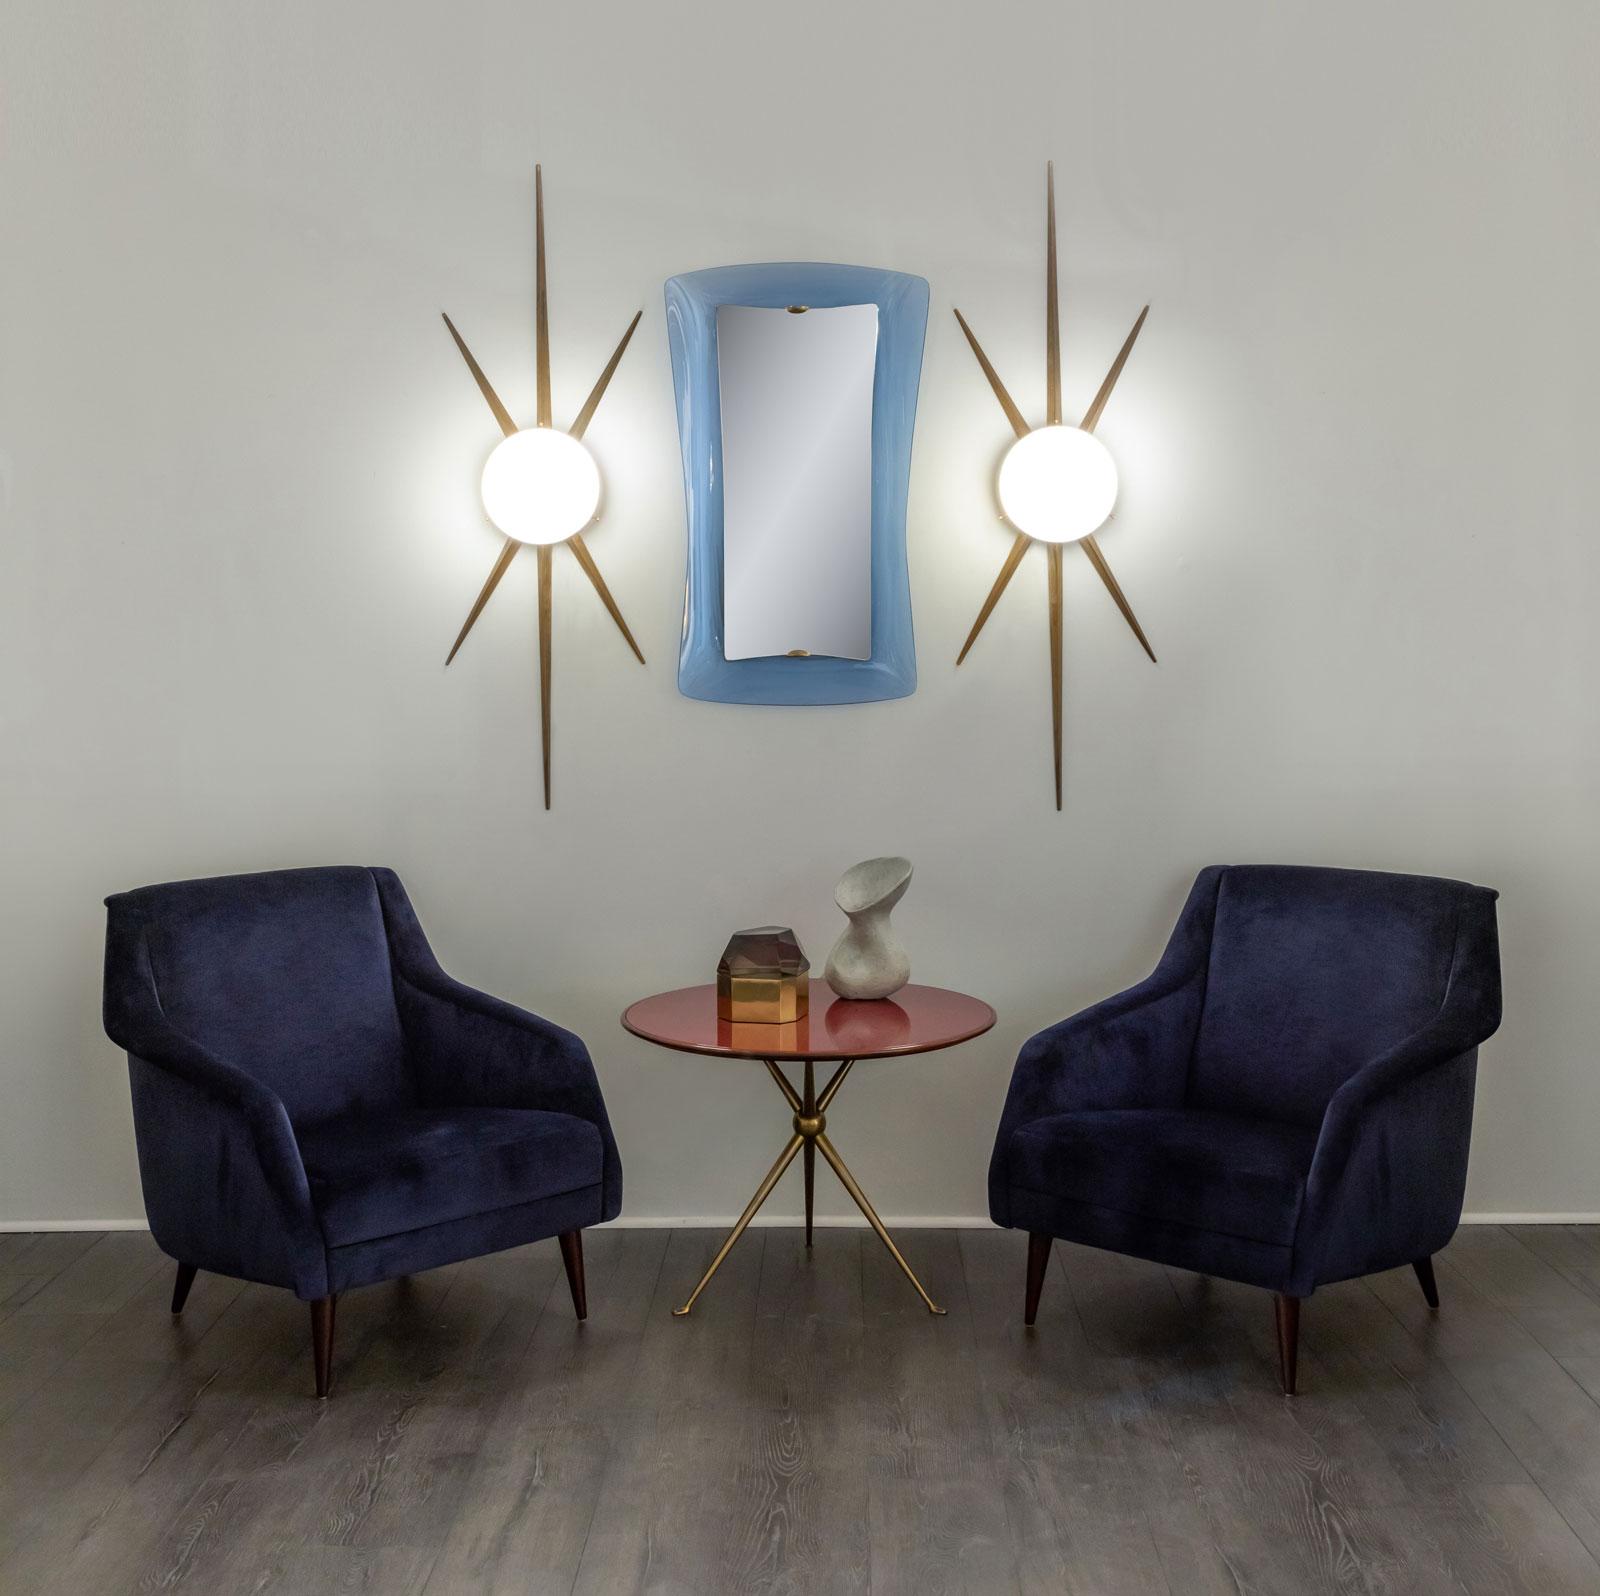 carli-chairs-borsani-table-optimized by  | soyun k.